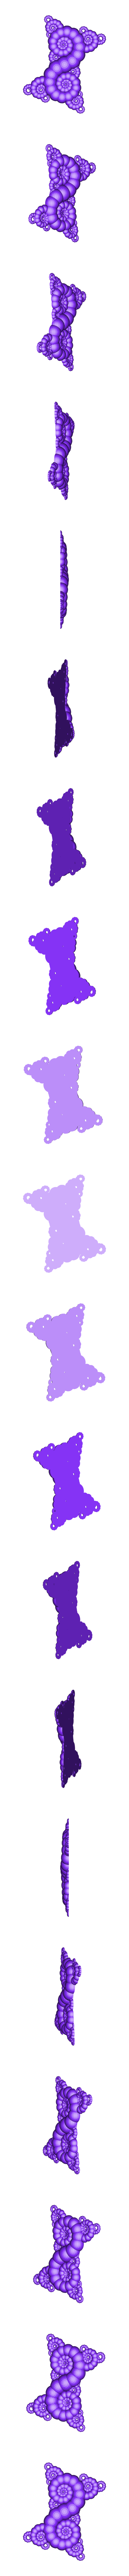 2_1_tentacles.stl Download free STL file Tentacle generator • 3D print object, ferjerez3d